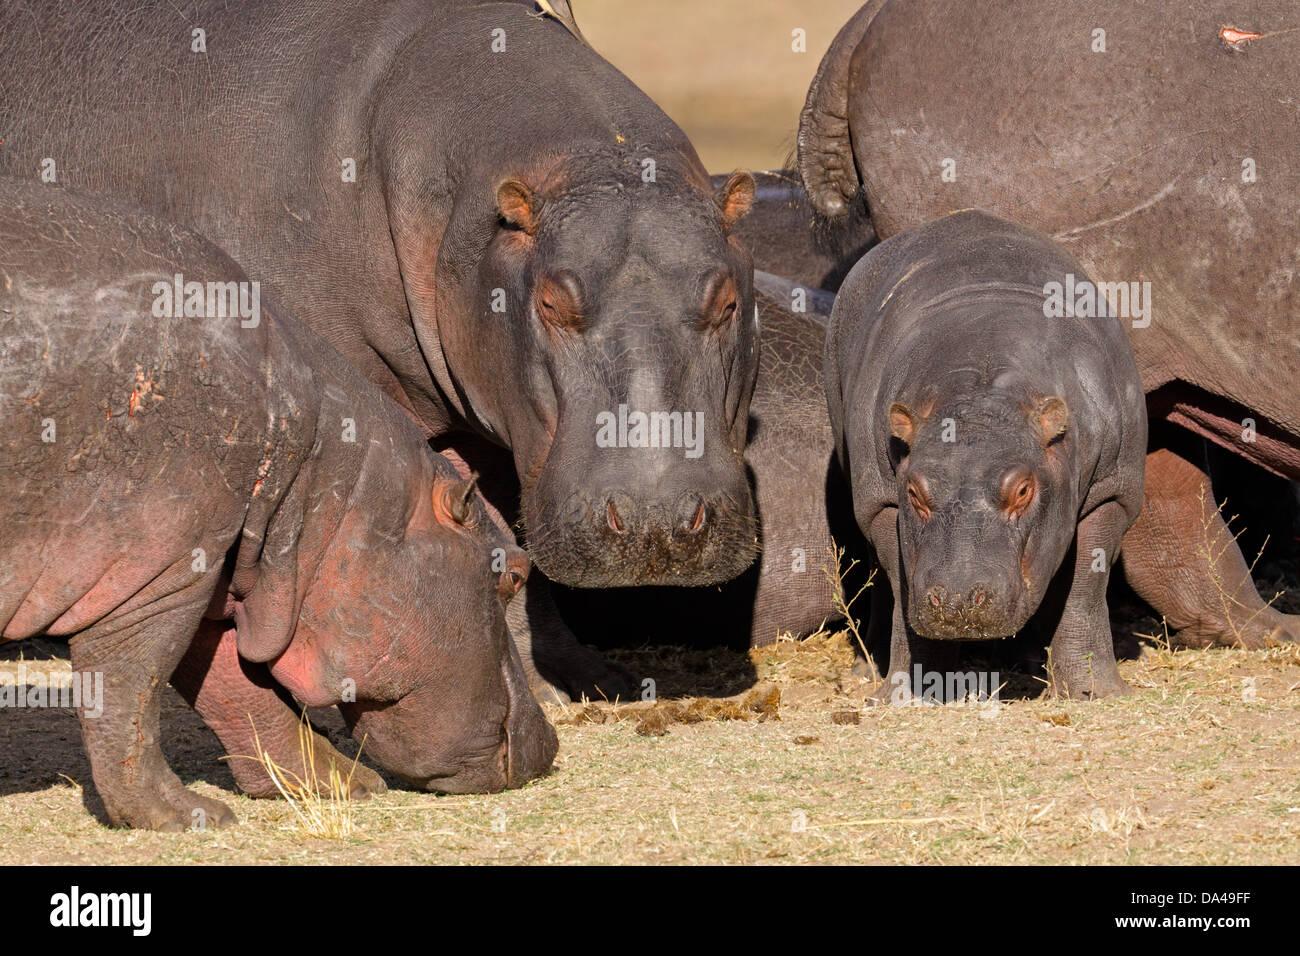 Hippo family (Hippopotamus amphibius) outside the water, South Africa Stock Photo